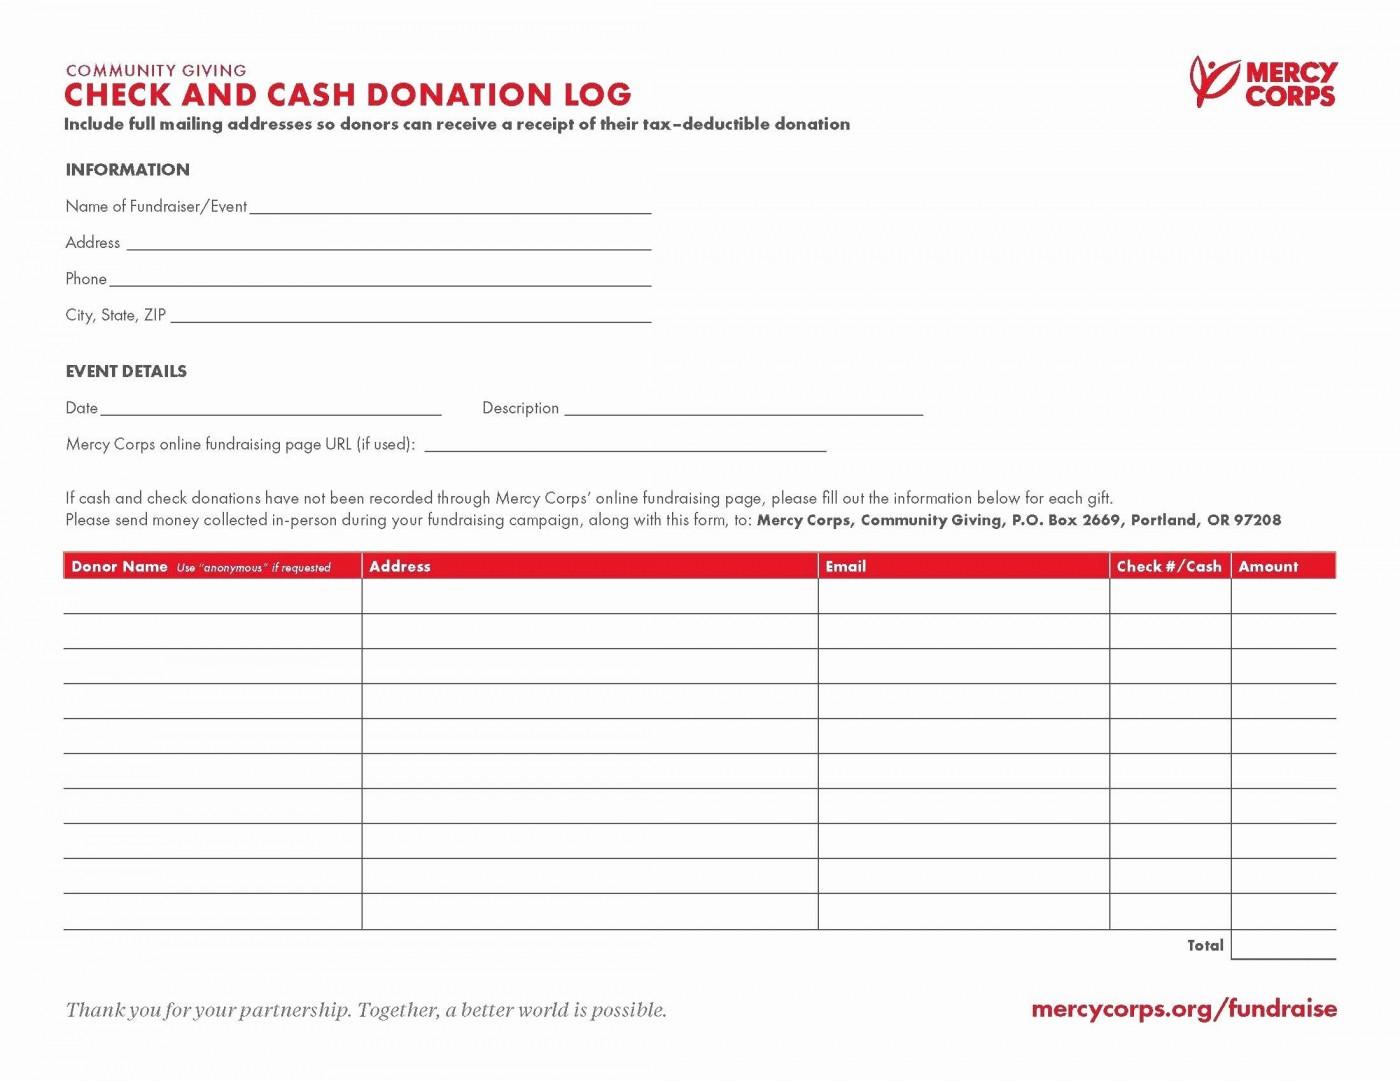 001 Shocking Tax Deductible Donation Receipt Template Australia Design 1400